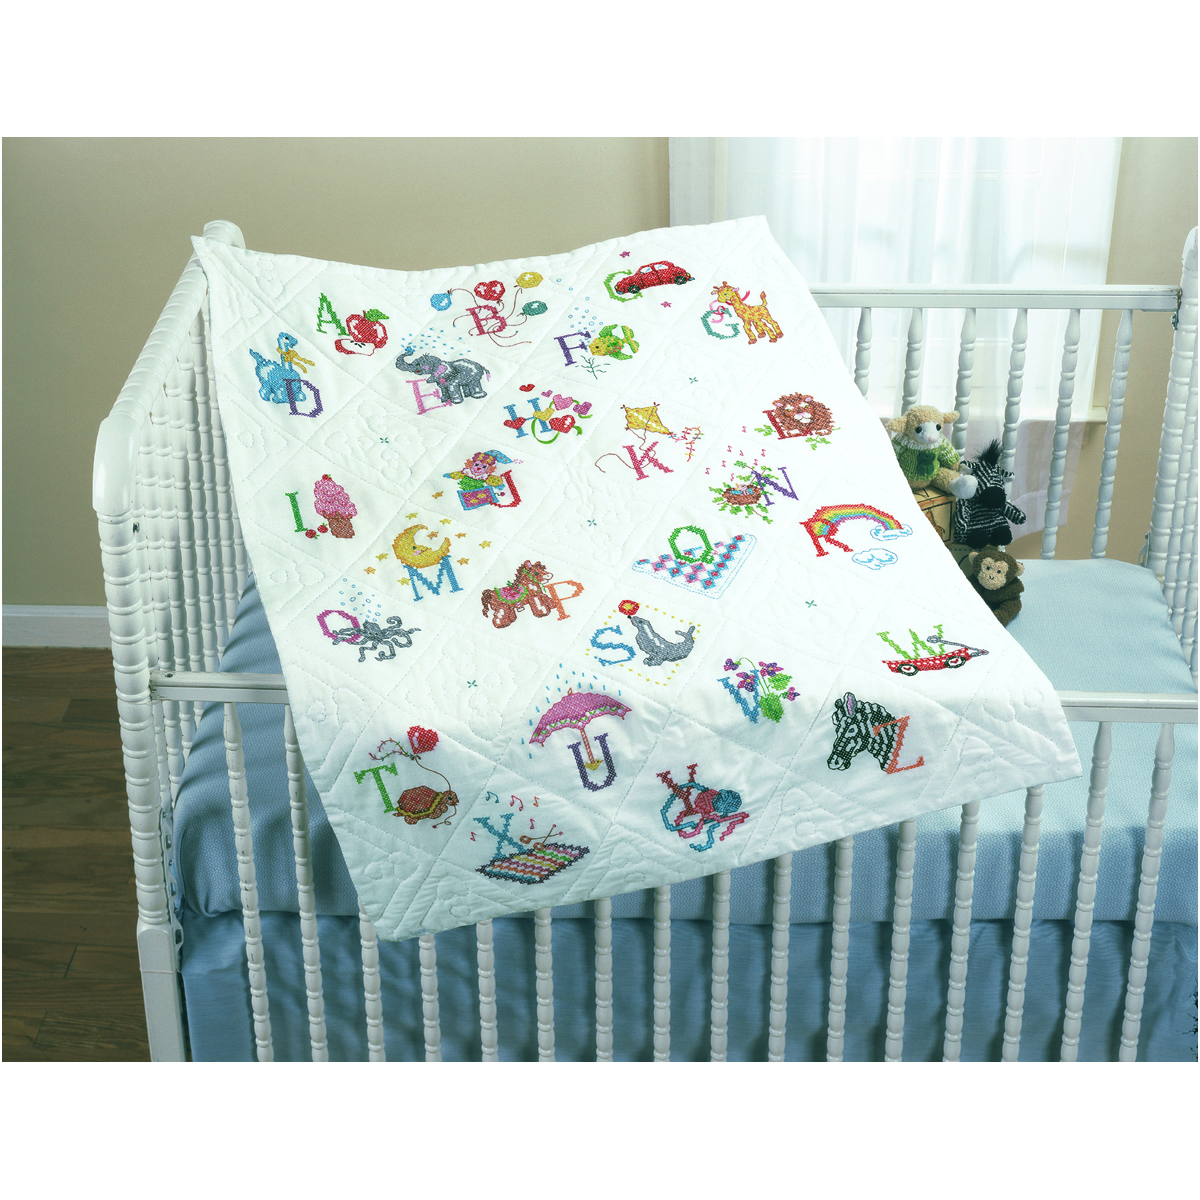 Bucilla ® Baby - Stamped Cross Stitch - Crib Ensembles - Alphabet Dreams - Quilt Top